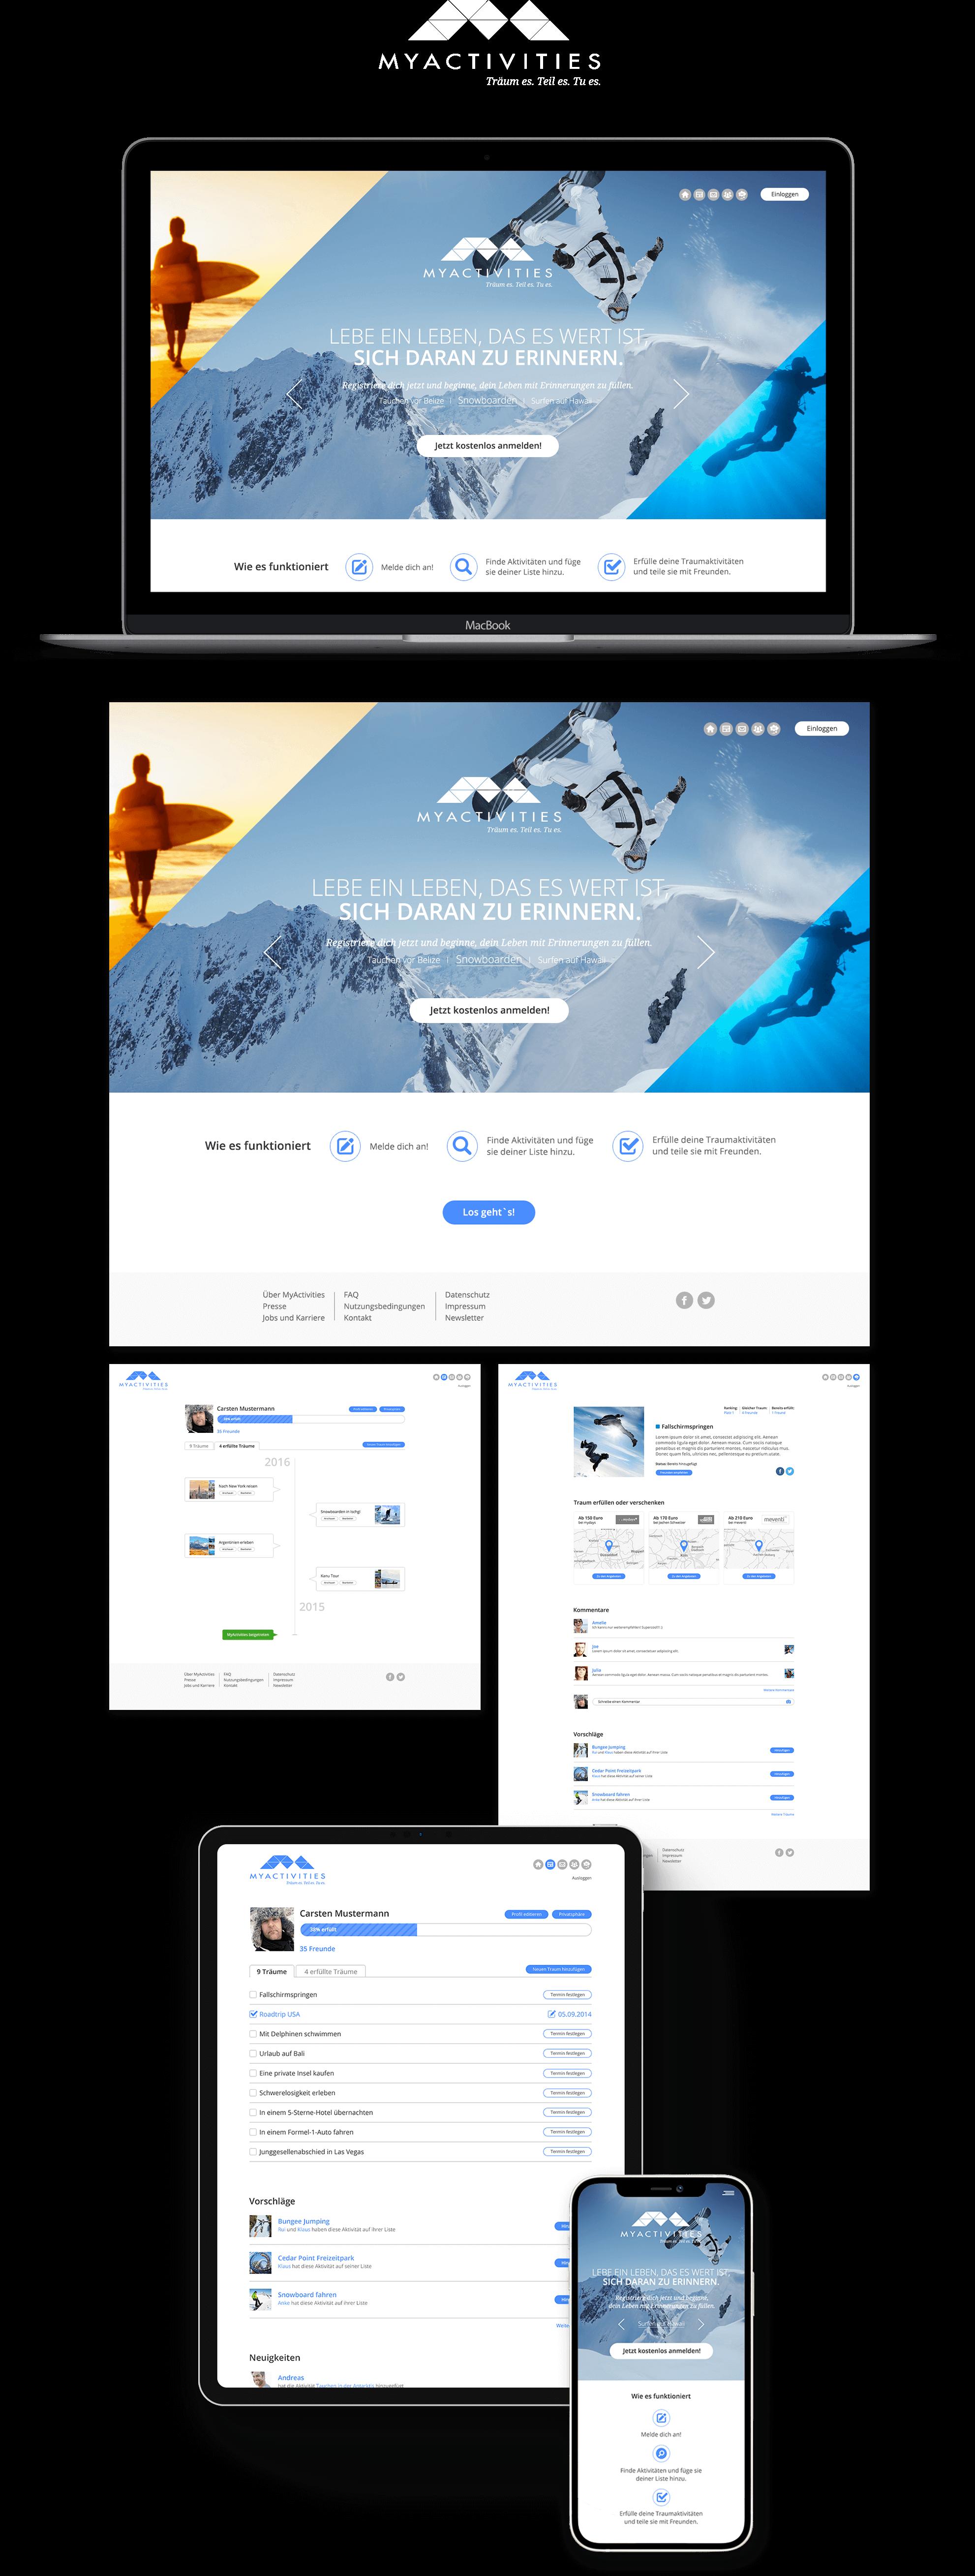 design-screendesign-ux-user-experience-grafik-koeln-thewhiteout-myactivities